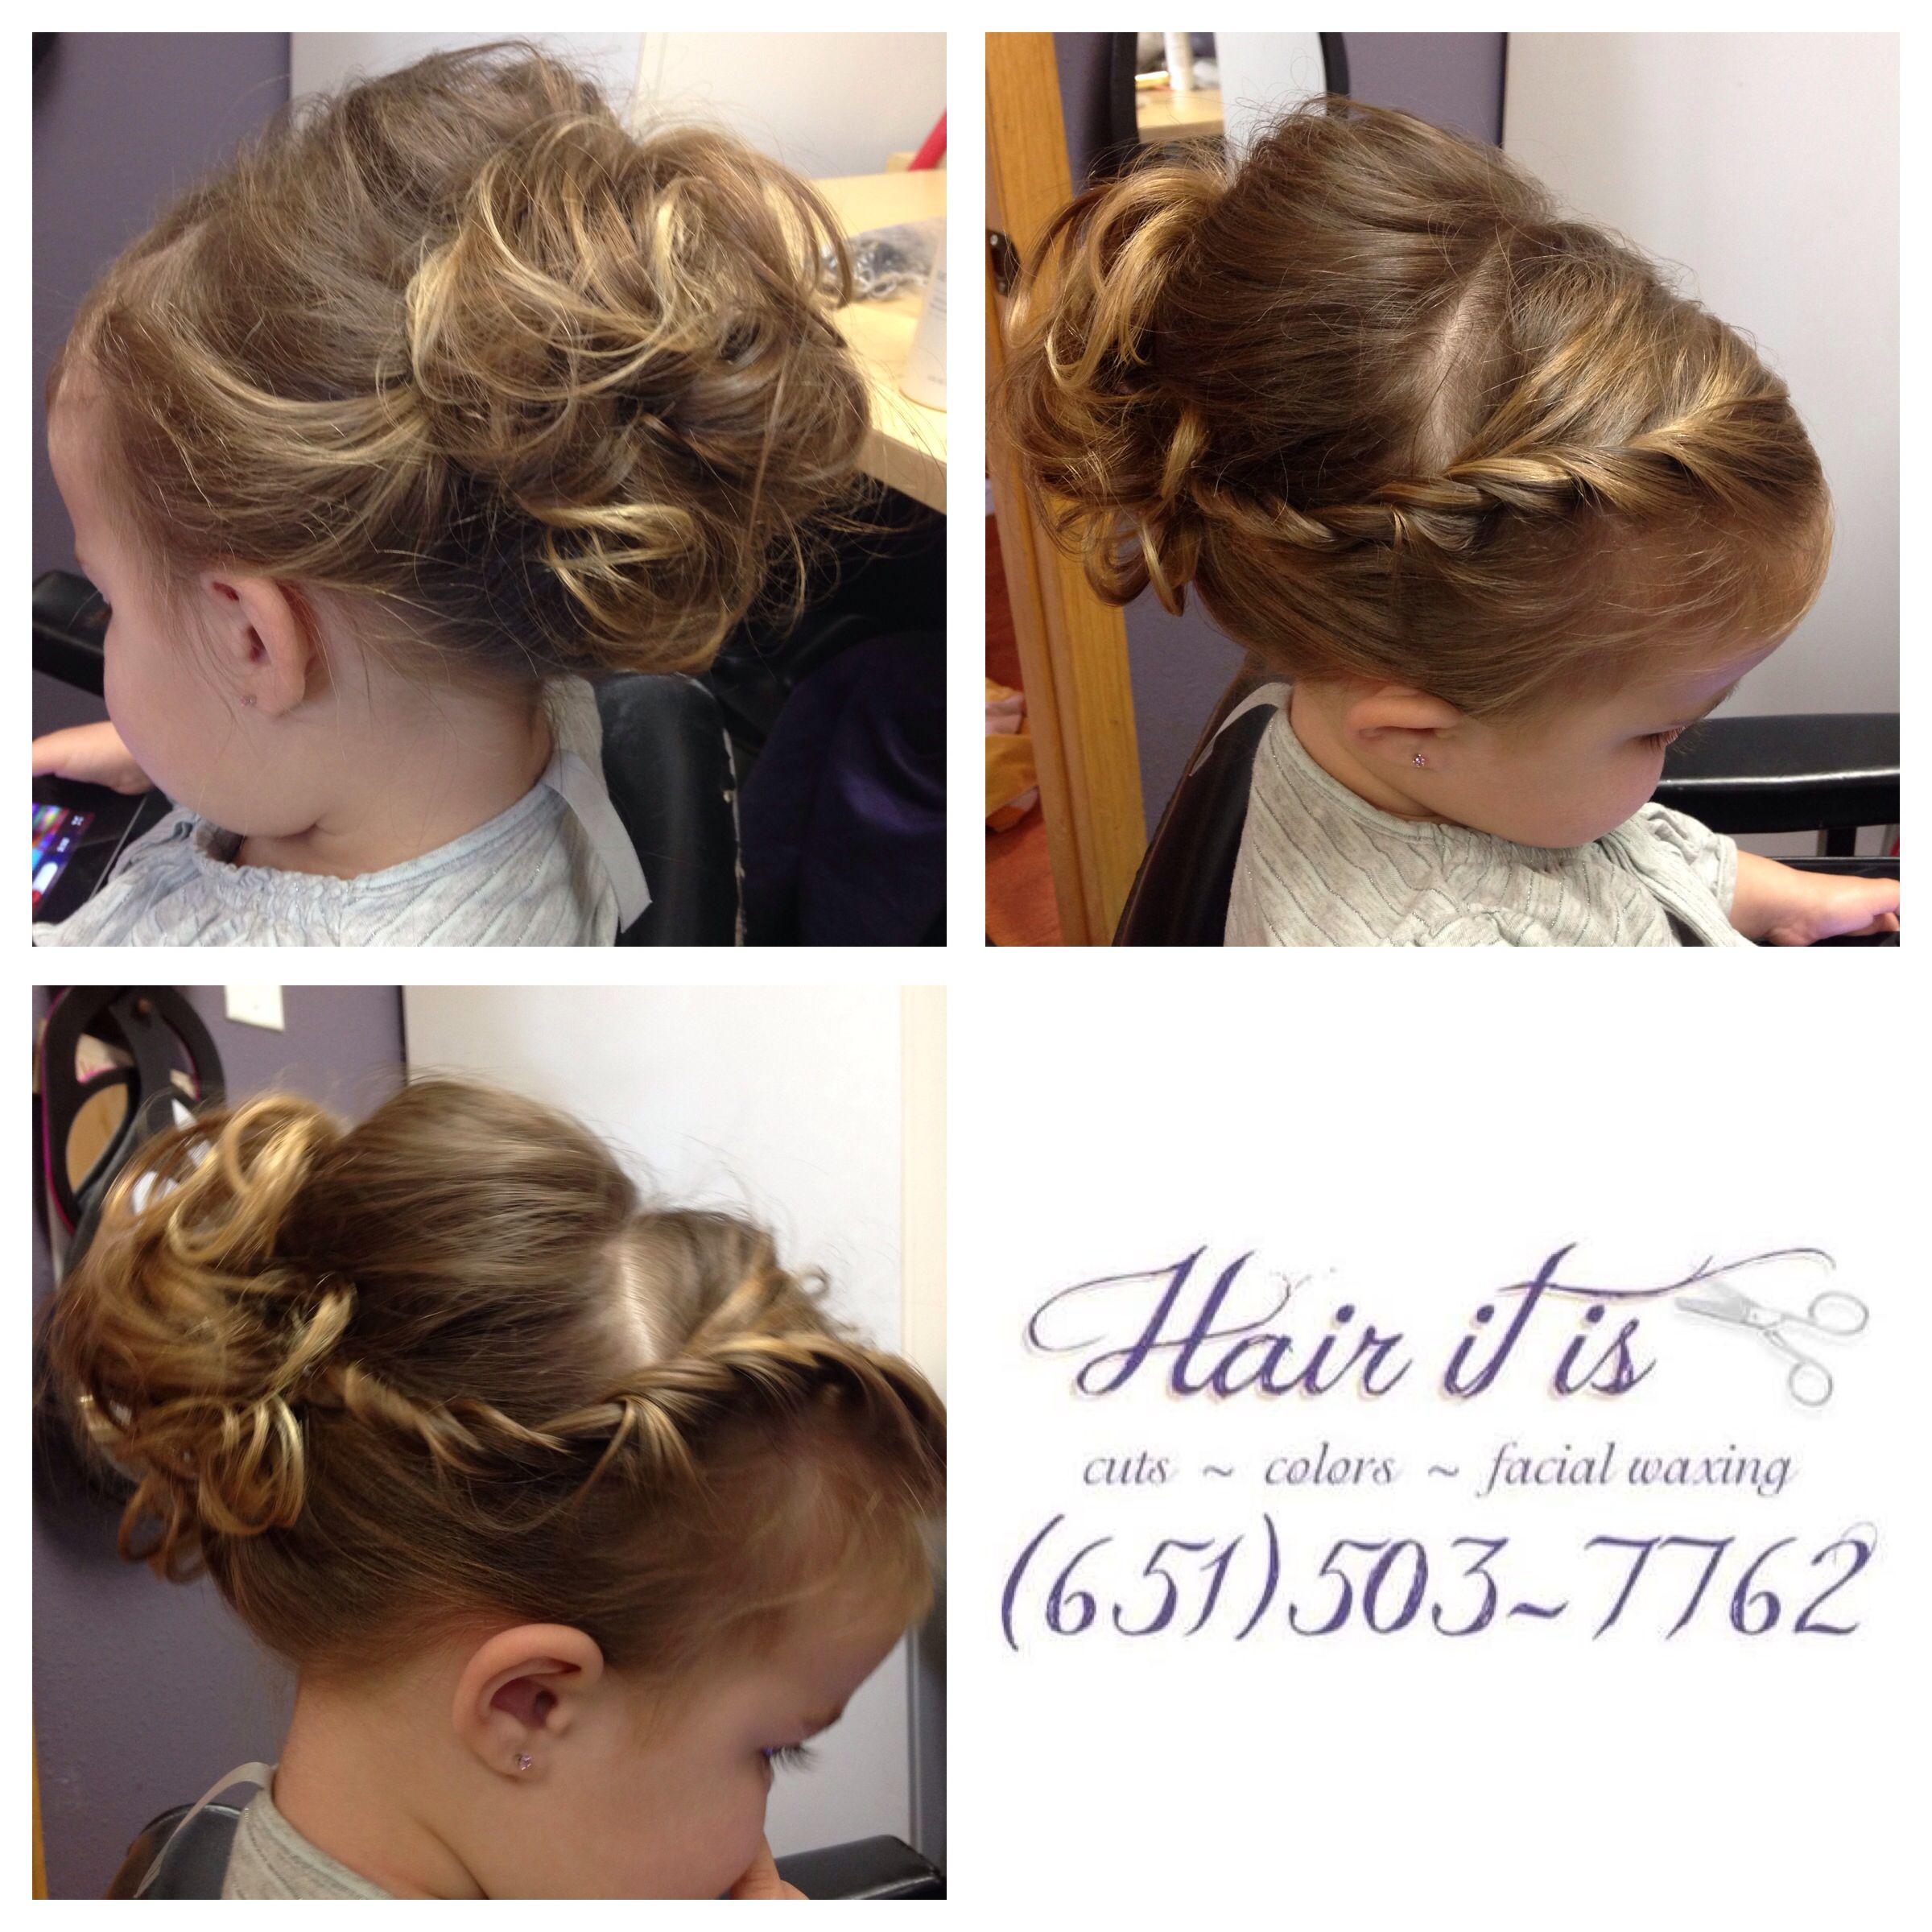 Side twist girls flower girl updo | Hair It Is Hair-Doos | Pinterest ...